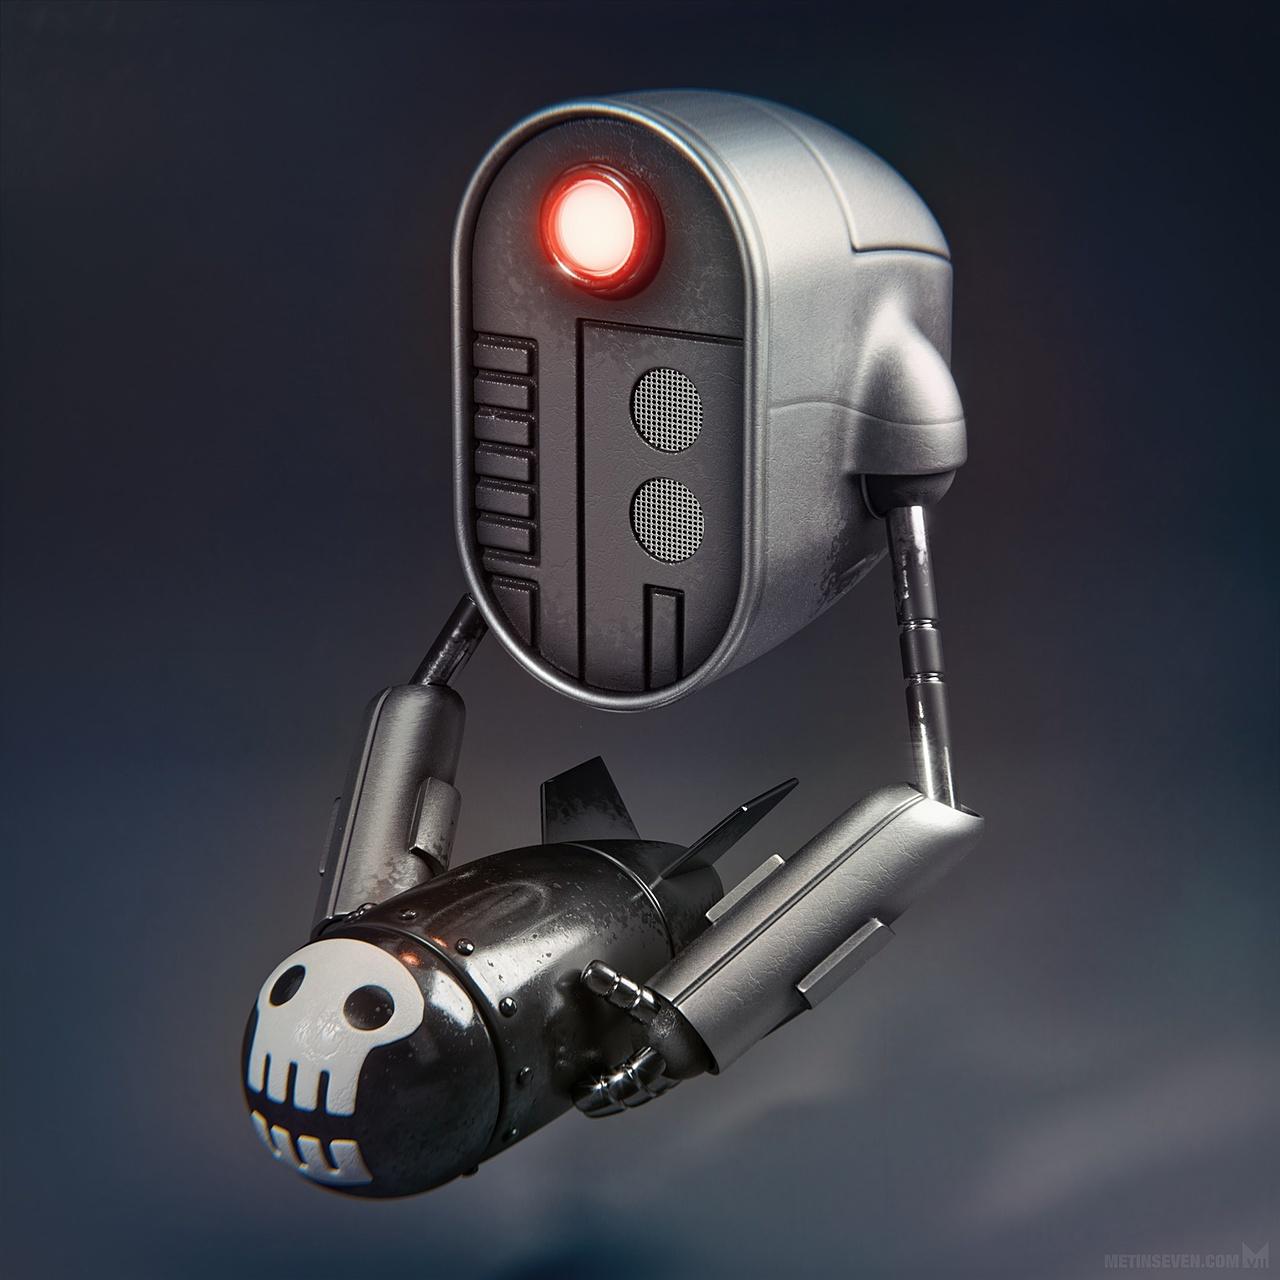 Bombot — War robot / military drone character design